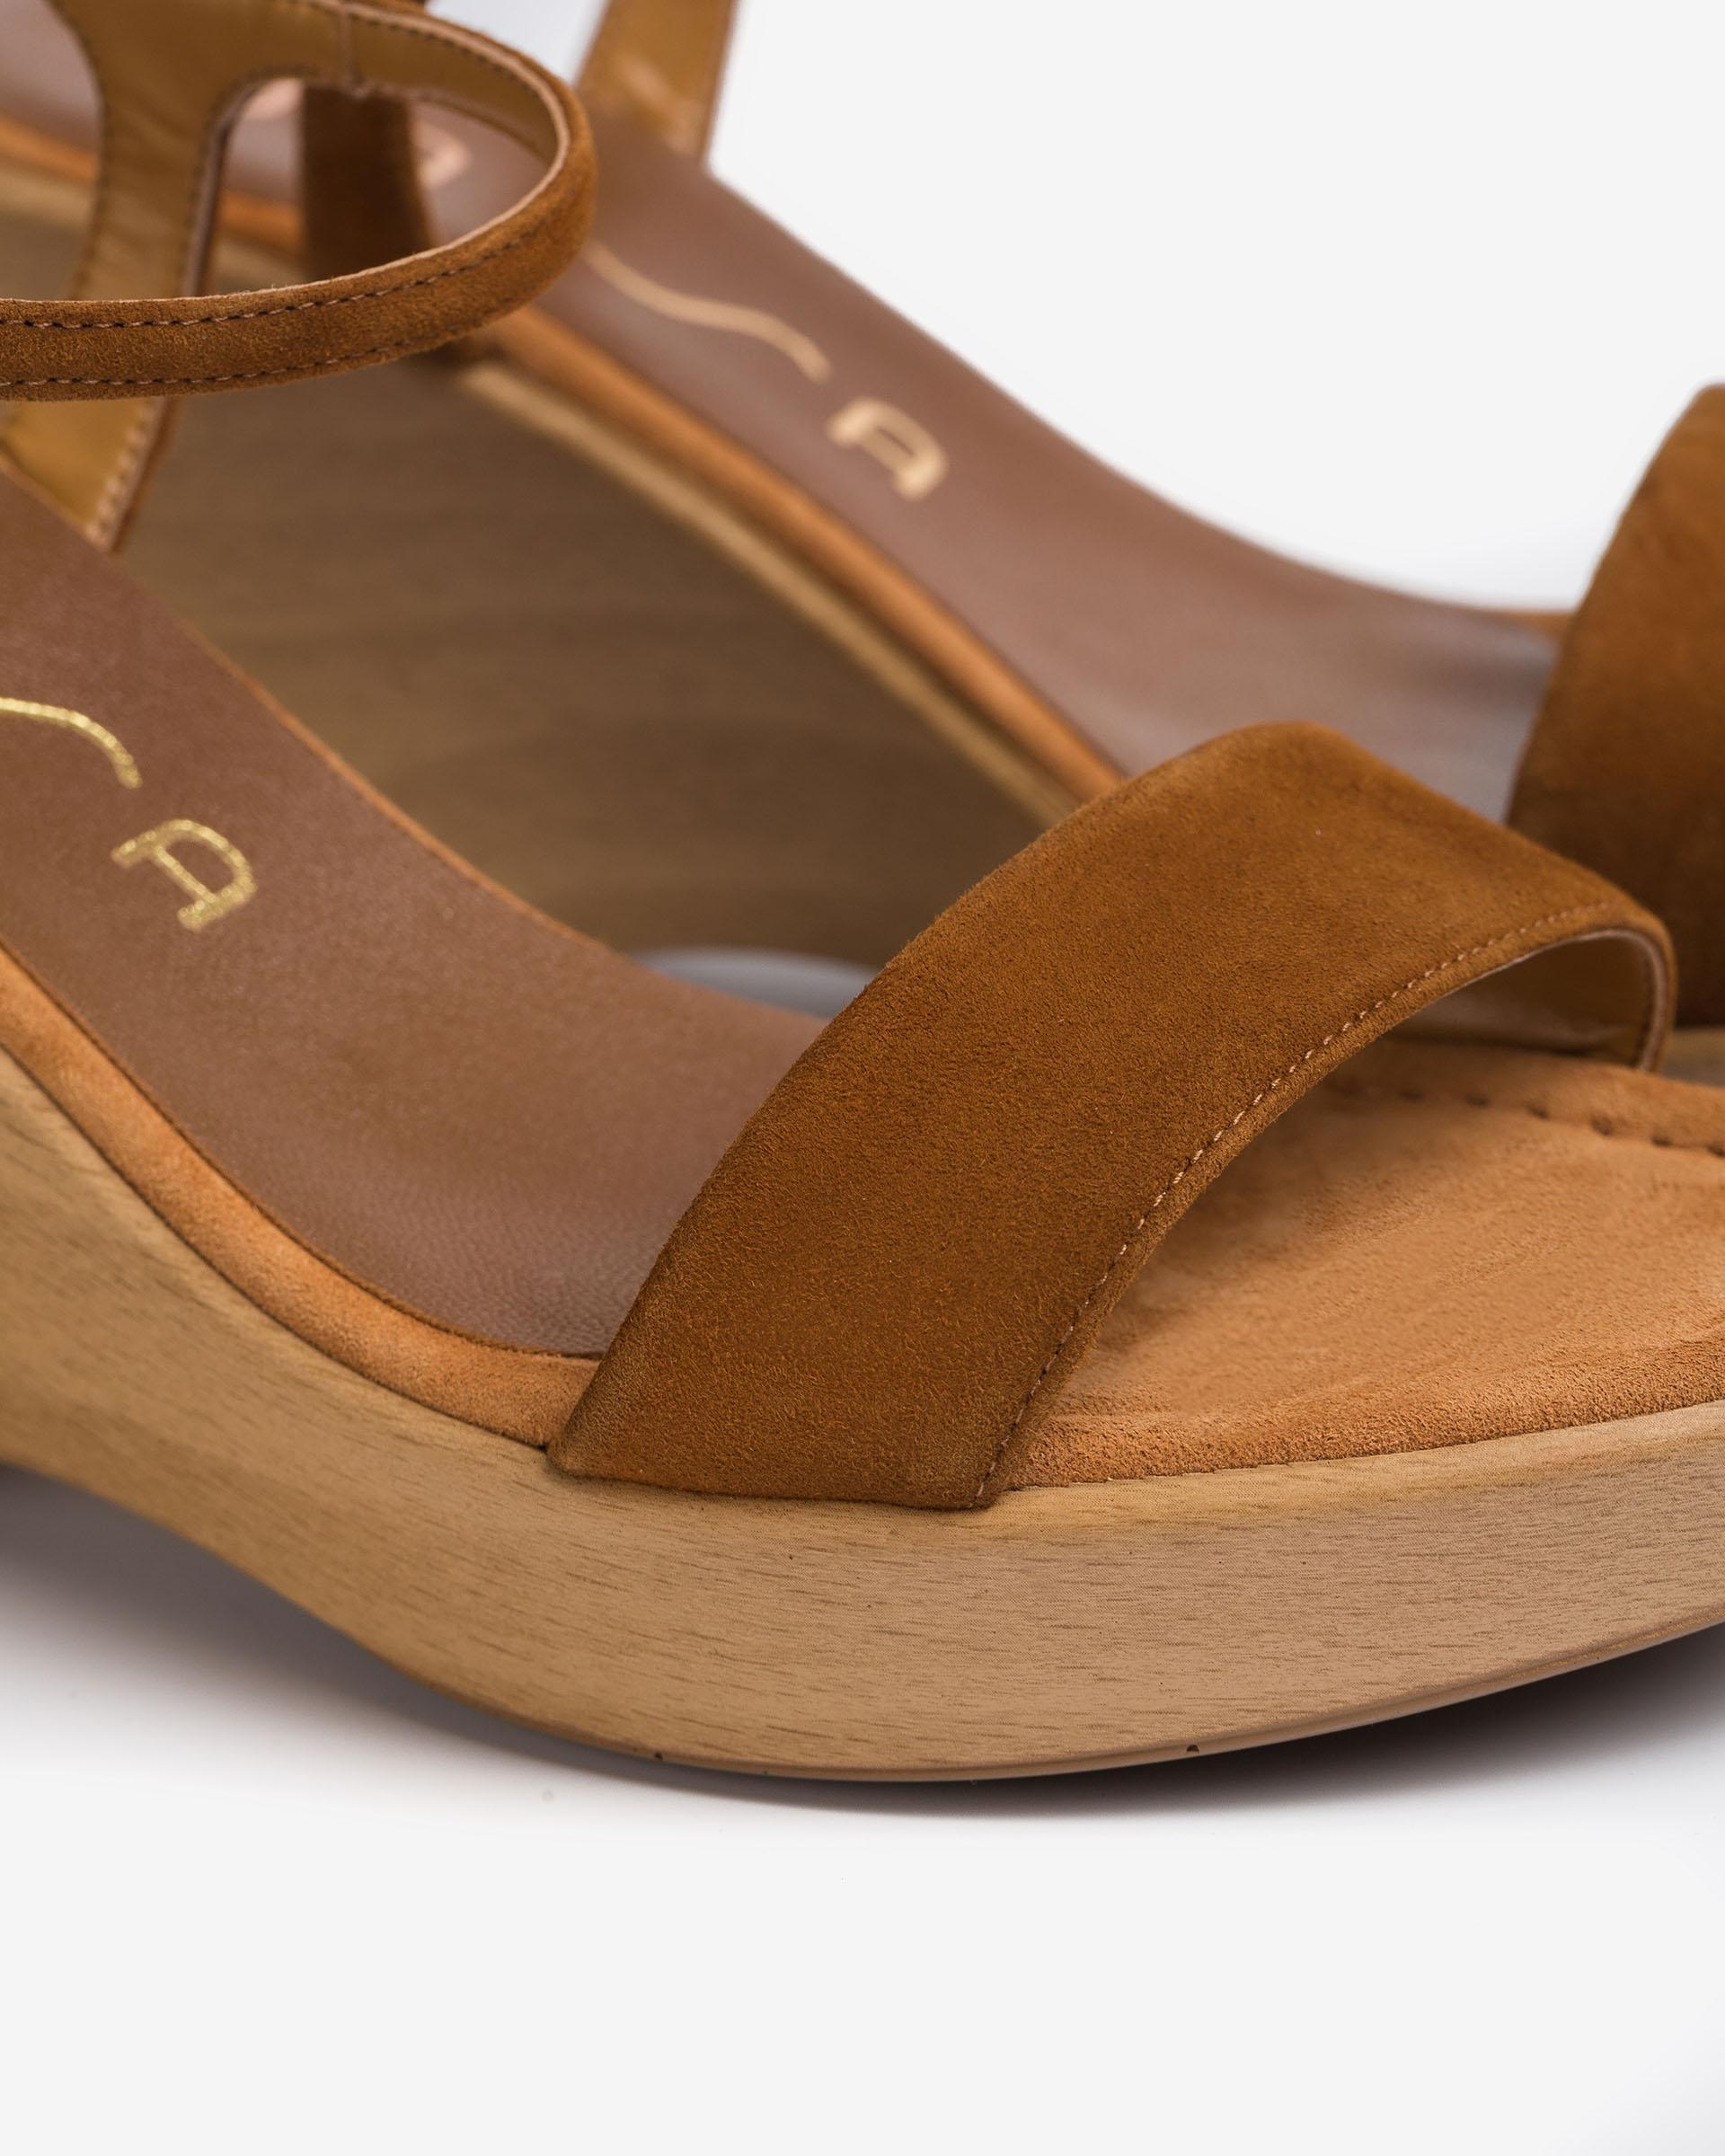 Unisa Sandals RITA_21_KS argan